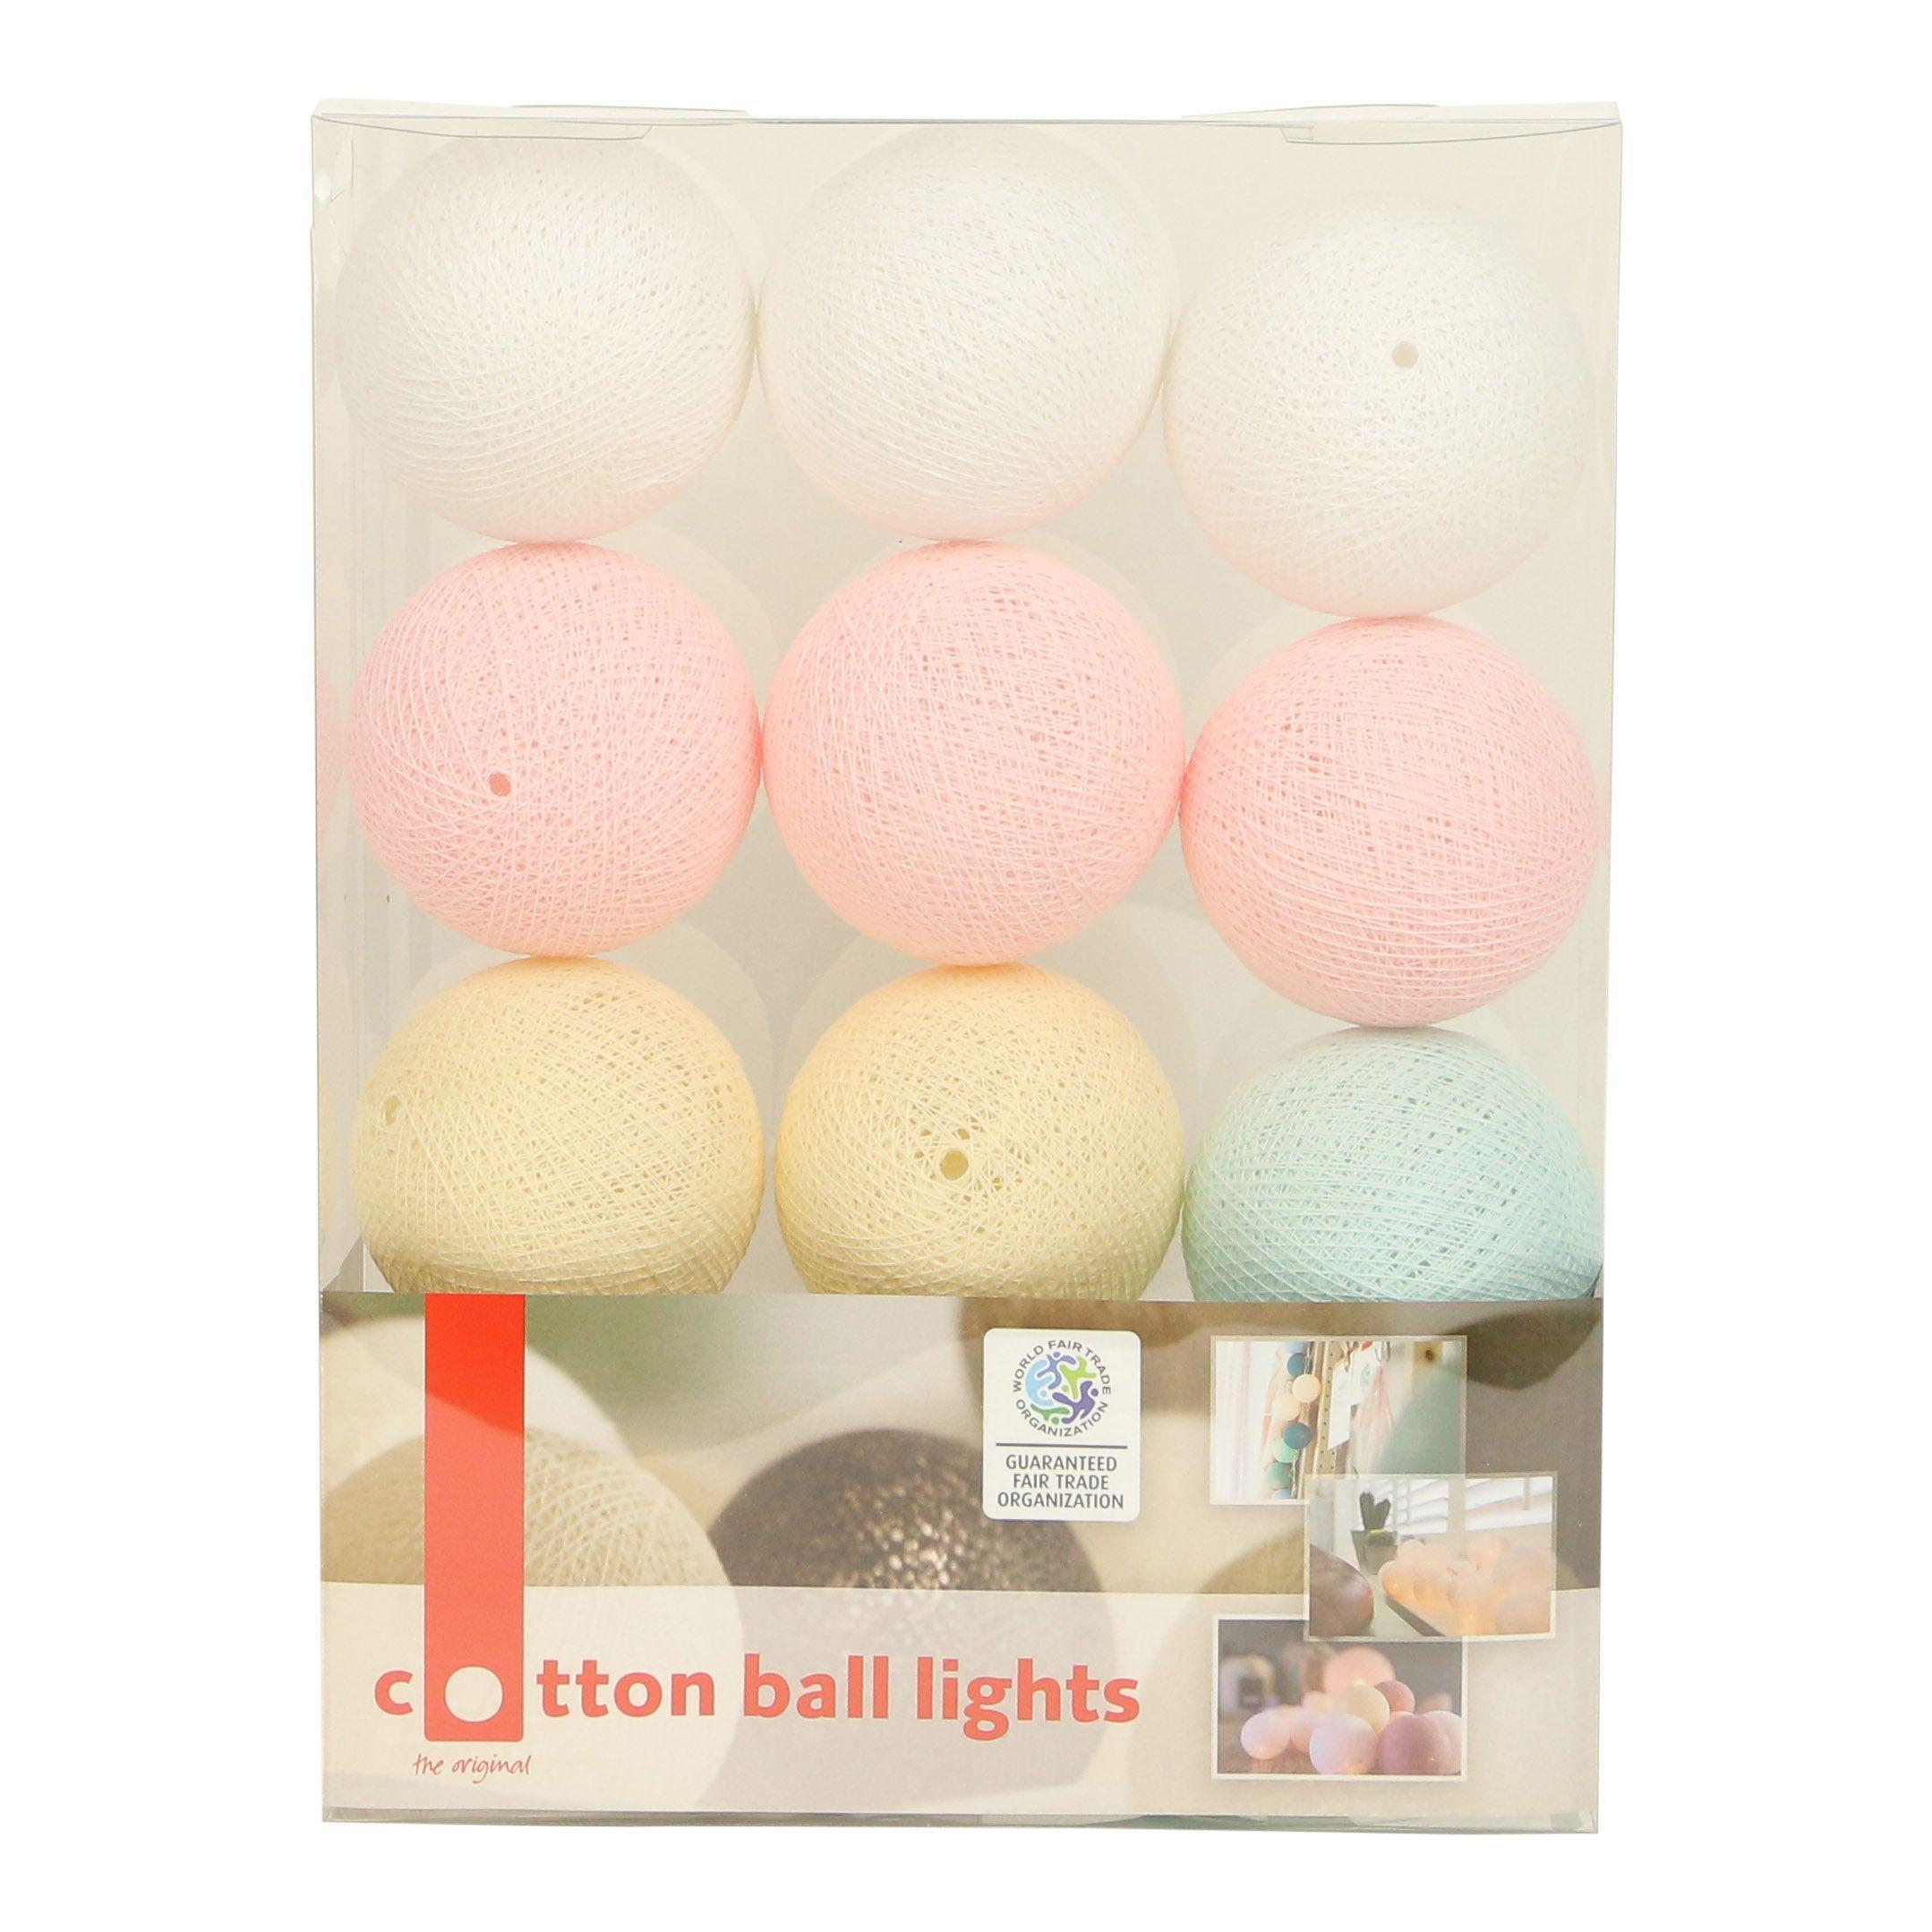 lichterkette mit b llen aus baumwolle cotton ball lights fairtrade fairanda. Black Bedroom Furniture Sets. Home Design Ideas